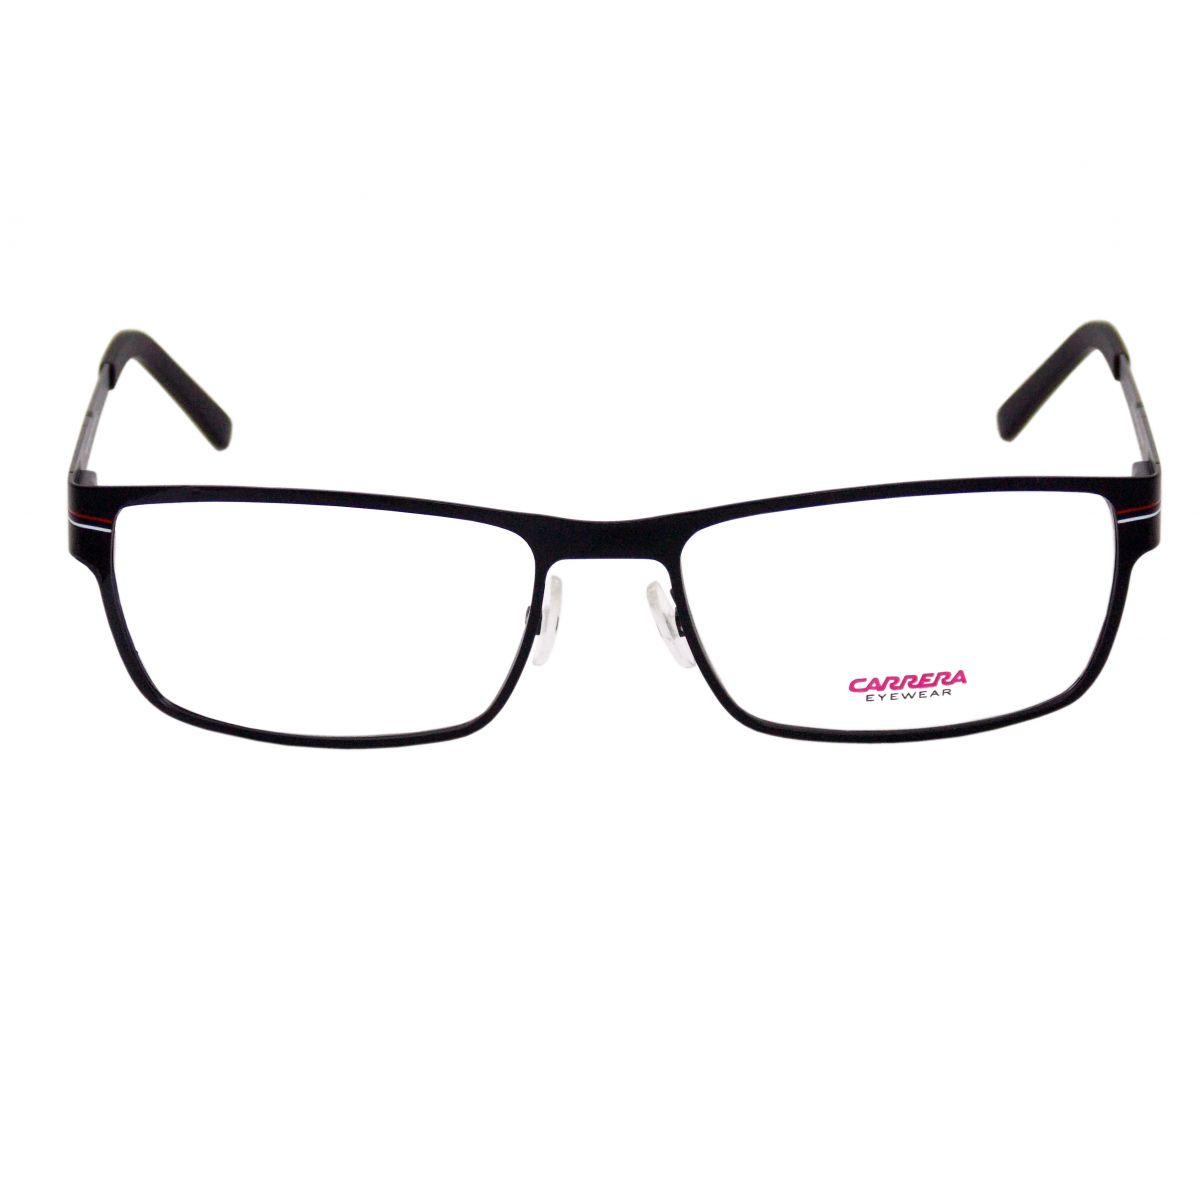 29c28a8f00f73 Oculos sem aros culos carrera t